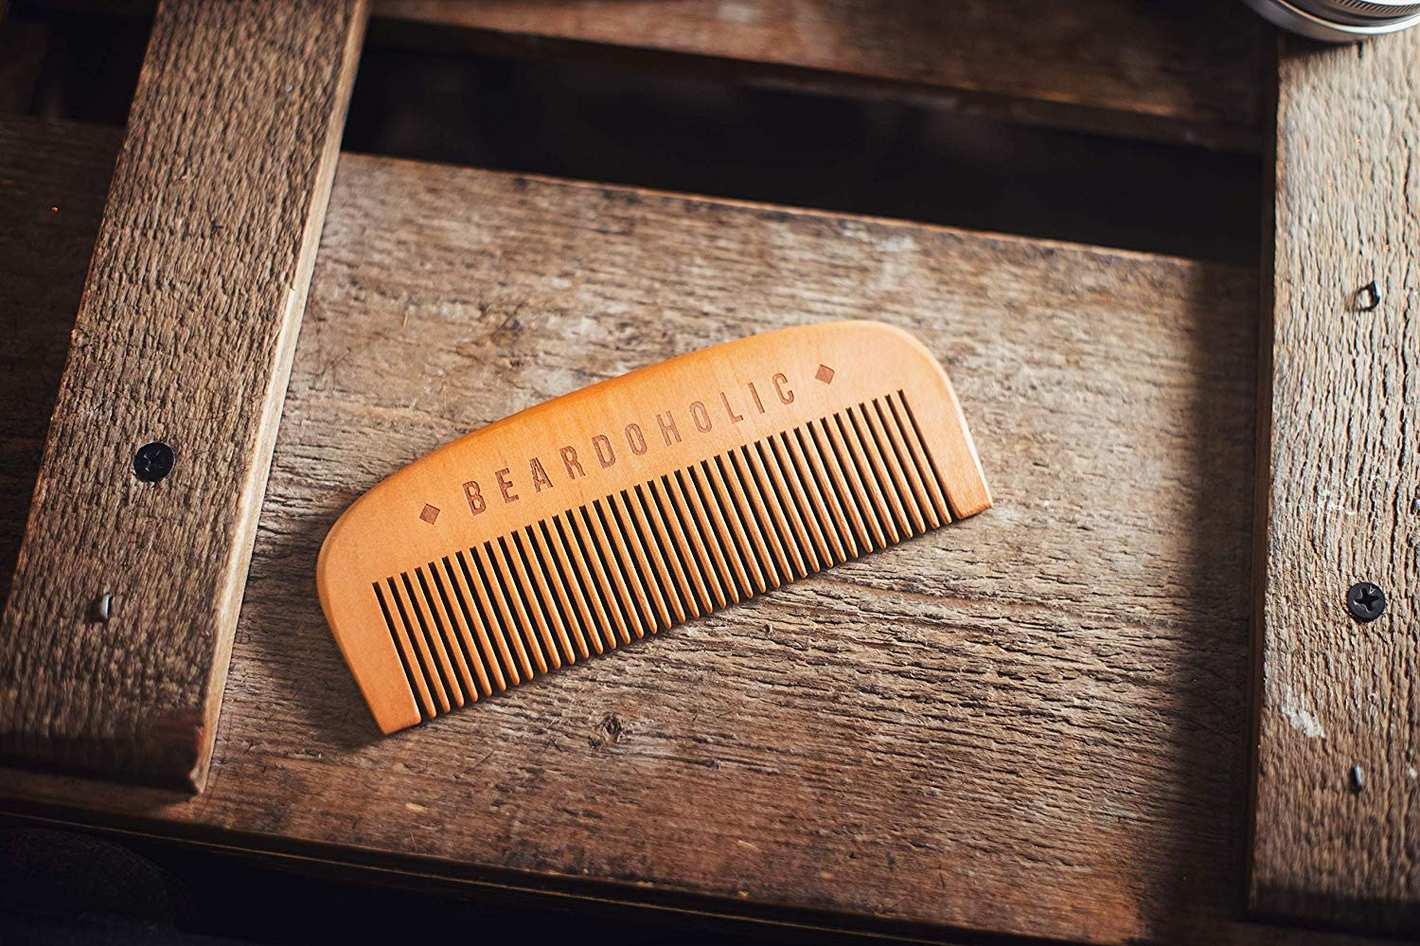 Beardoholic Fine Toothed Beard Comb